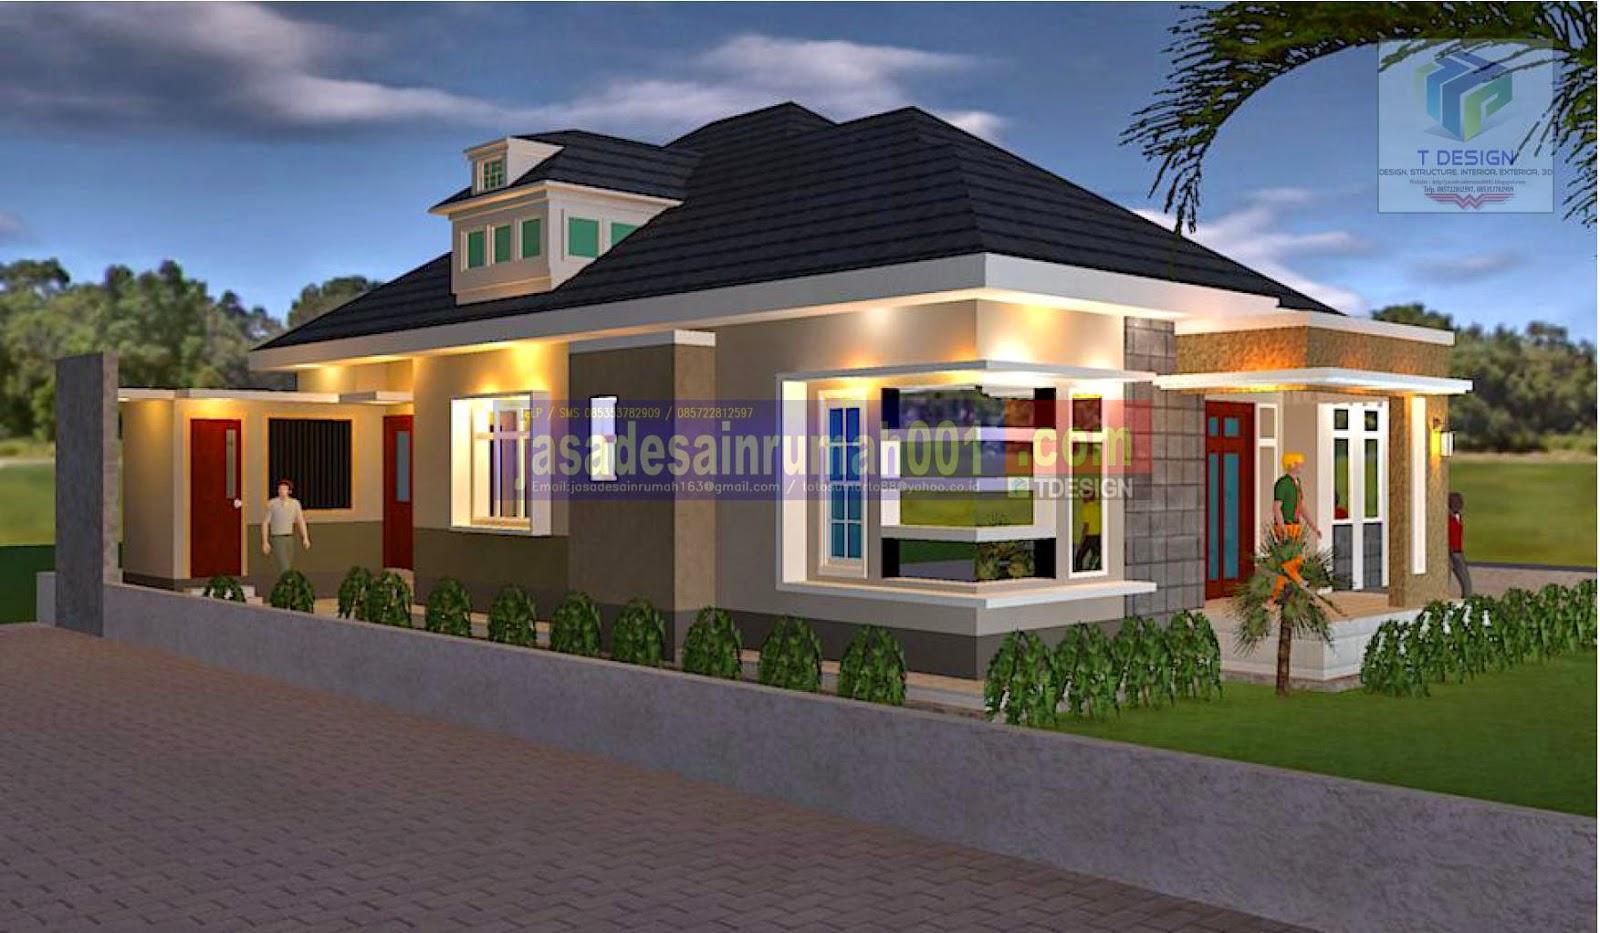 Informasi Desain Rumah Minimalis Modern 10 X 15 Prosforjdacom